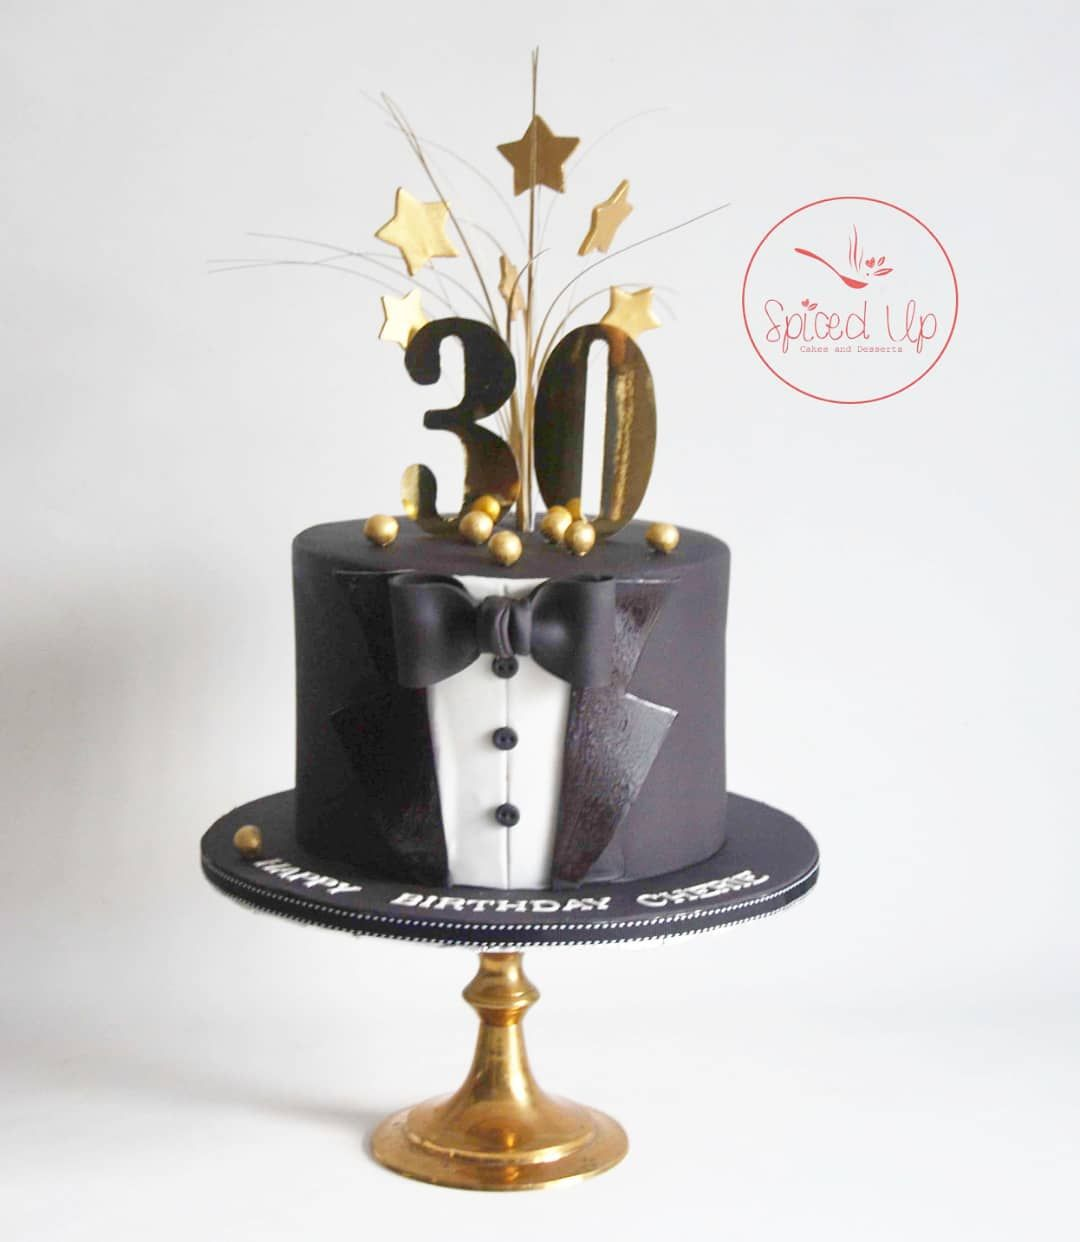 30th Birthday Cake Cakeformen 30thbirthdaycake Torontocake Torontoweddingcakes Scarboroughc Funny Birthday Cakes 30 Birthday Cake 30th Birthday Cakes For Men